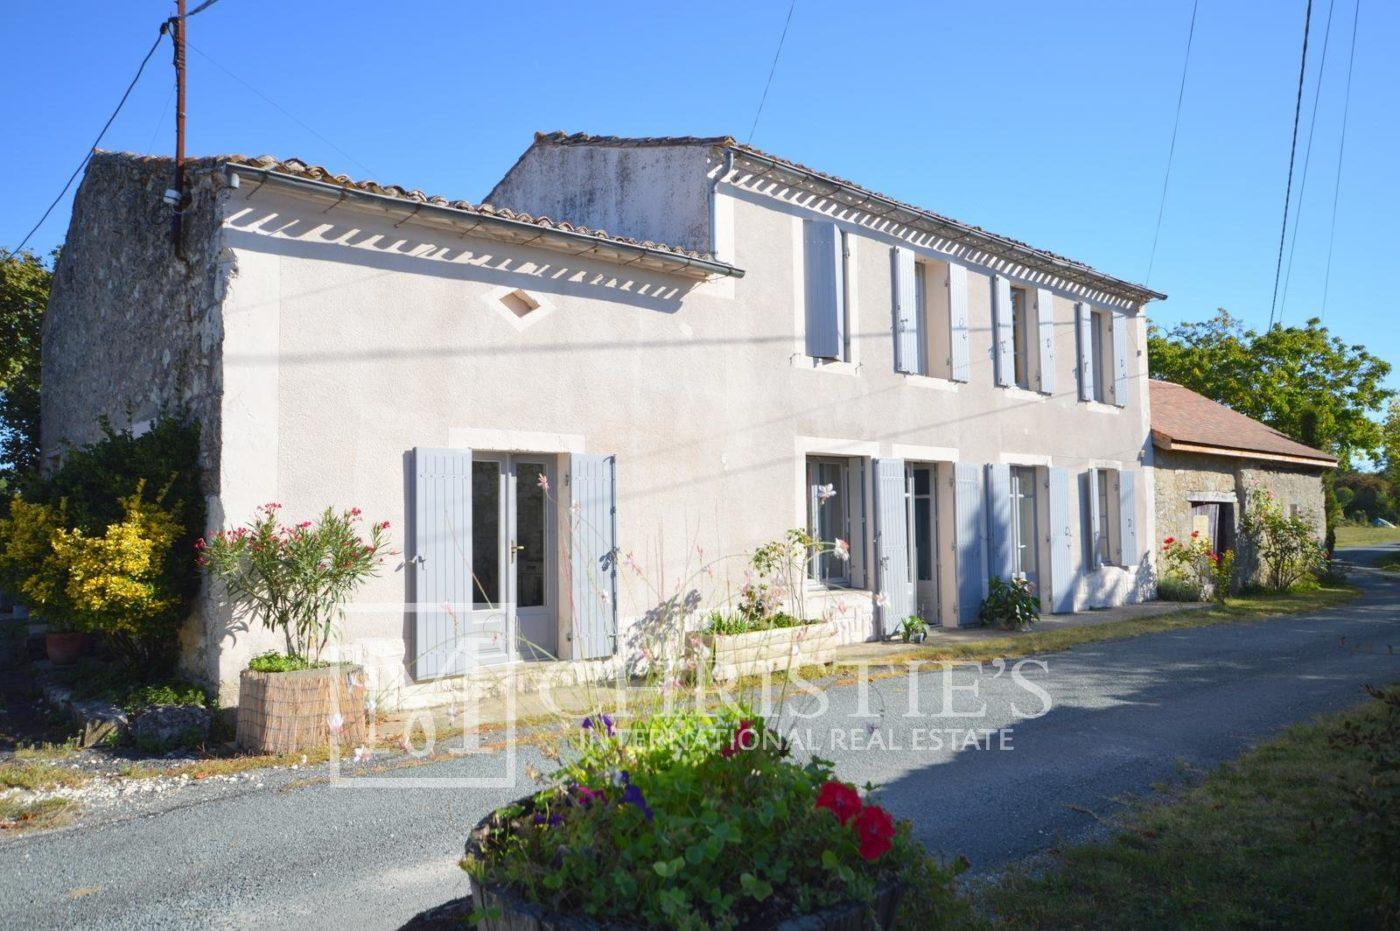 Building - Idyllic awarding winning 11 hectare vineyard in one of Bergerac's premier appellations